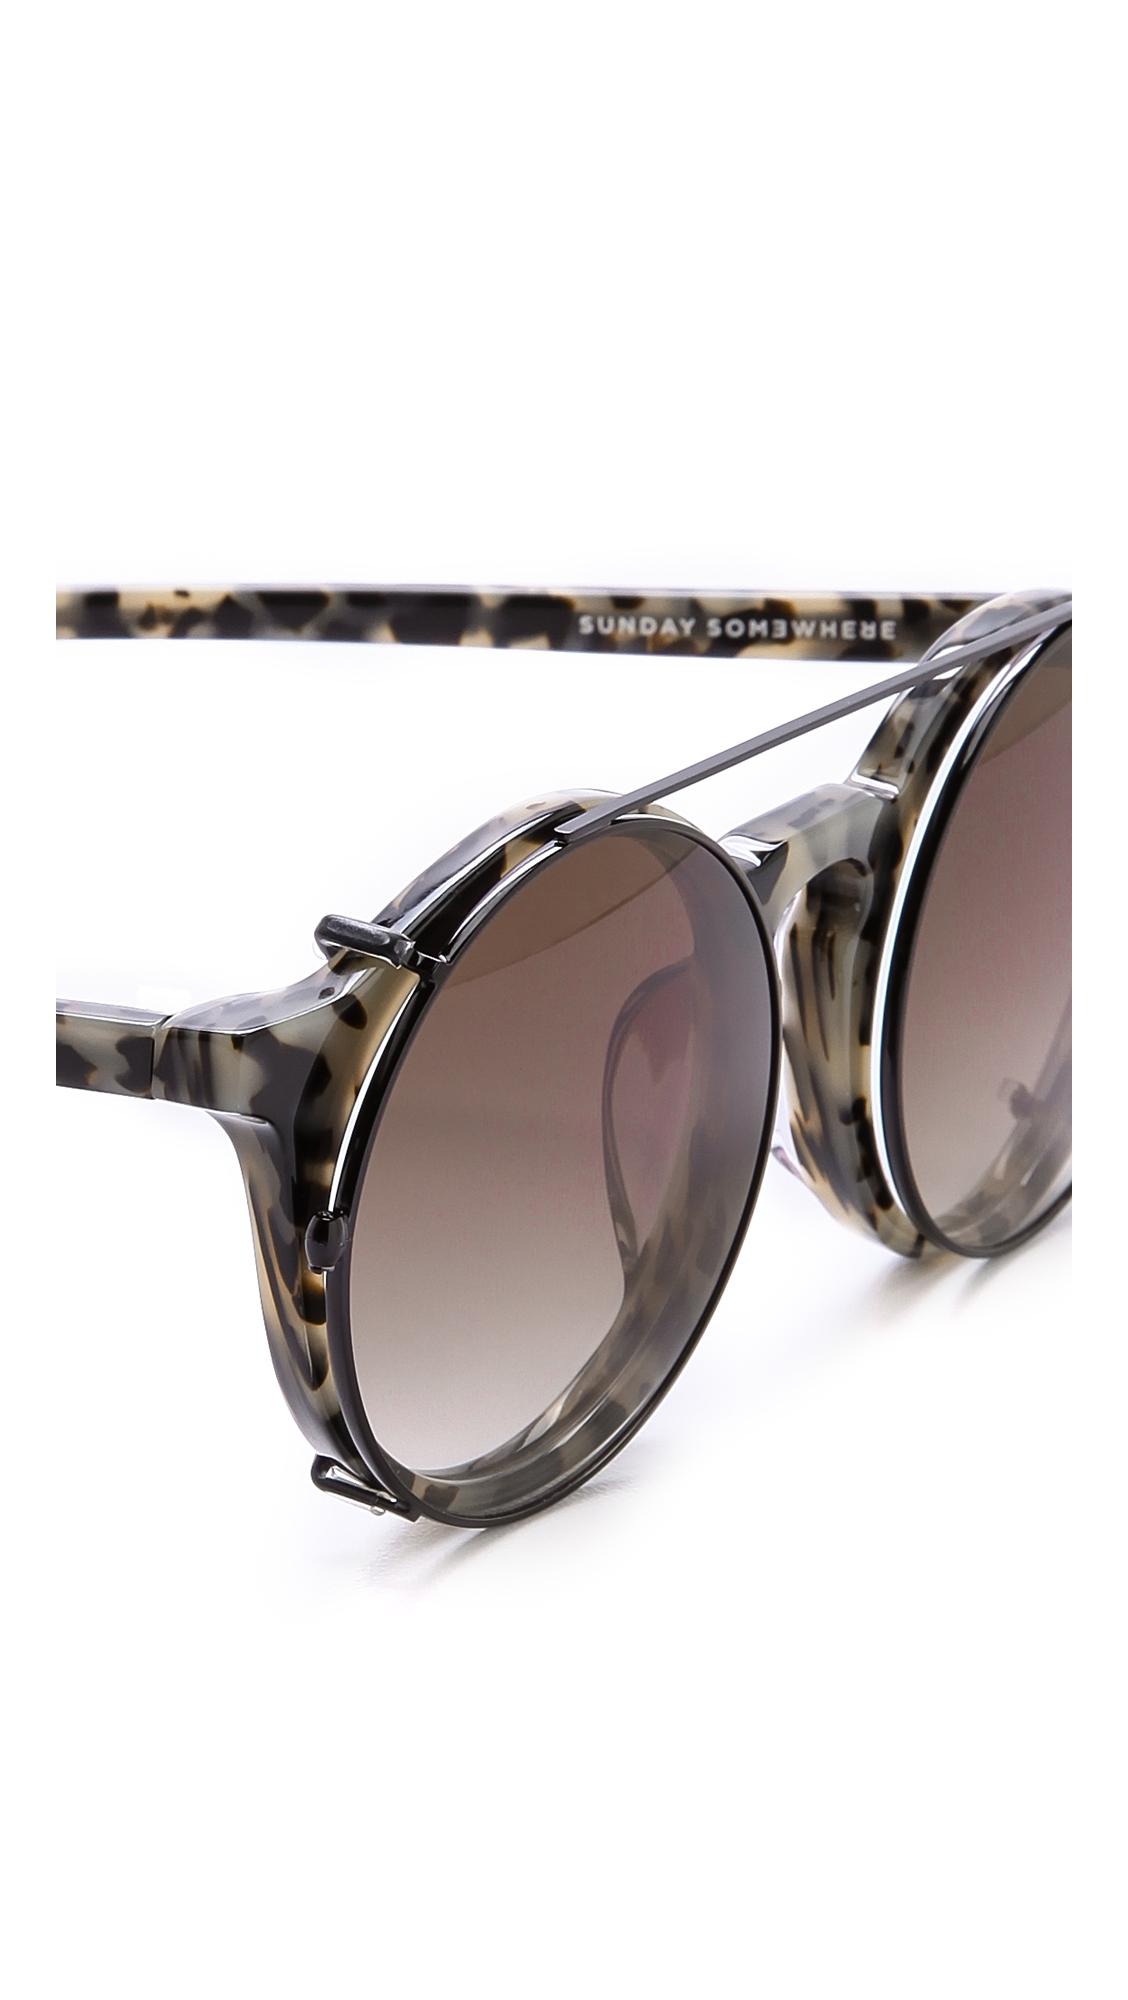 a1cf65e616b Lyst - Sunday Somewhere Matahari Sunglasses Cookies and Cream in Natural